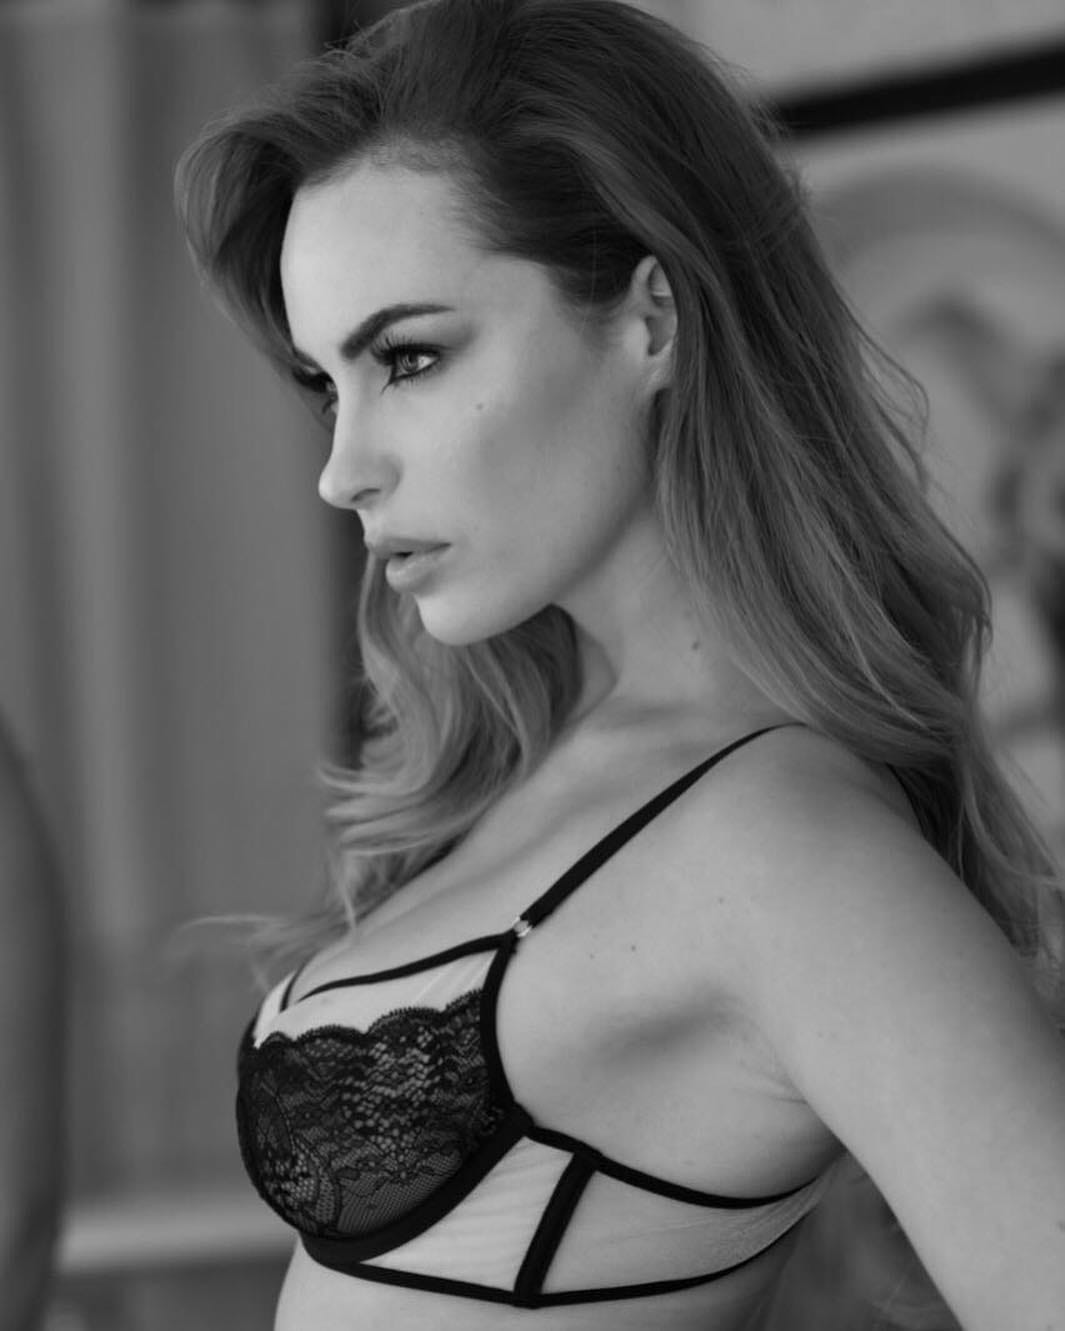 Images Audrey Bouette nude (17 photos), Tits, Bikini, Feet, butt 2019